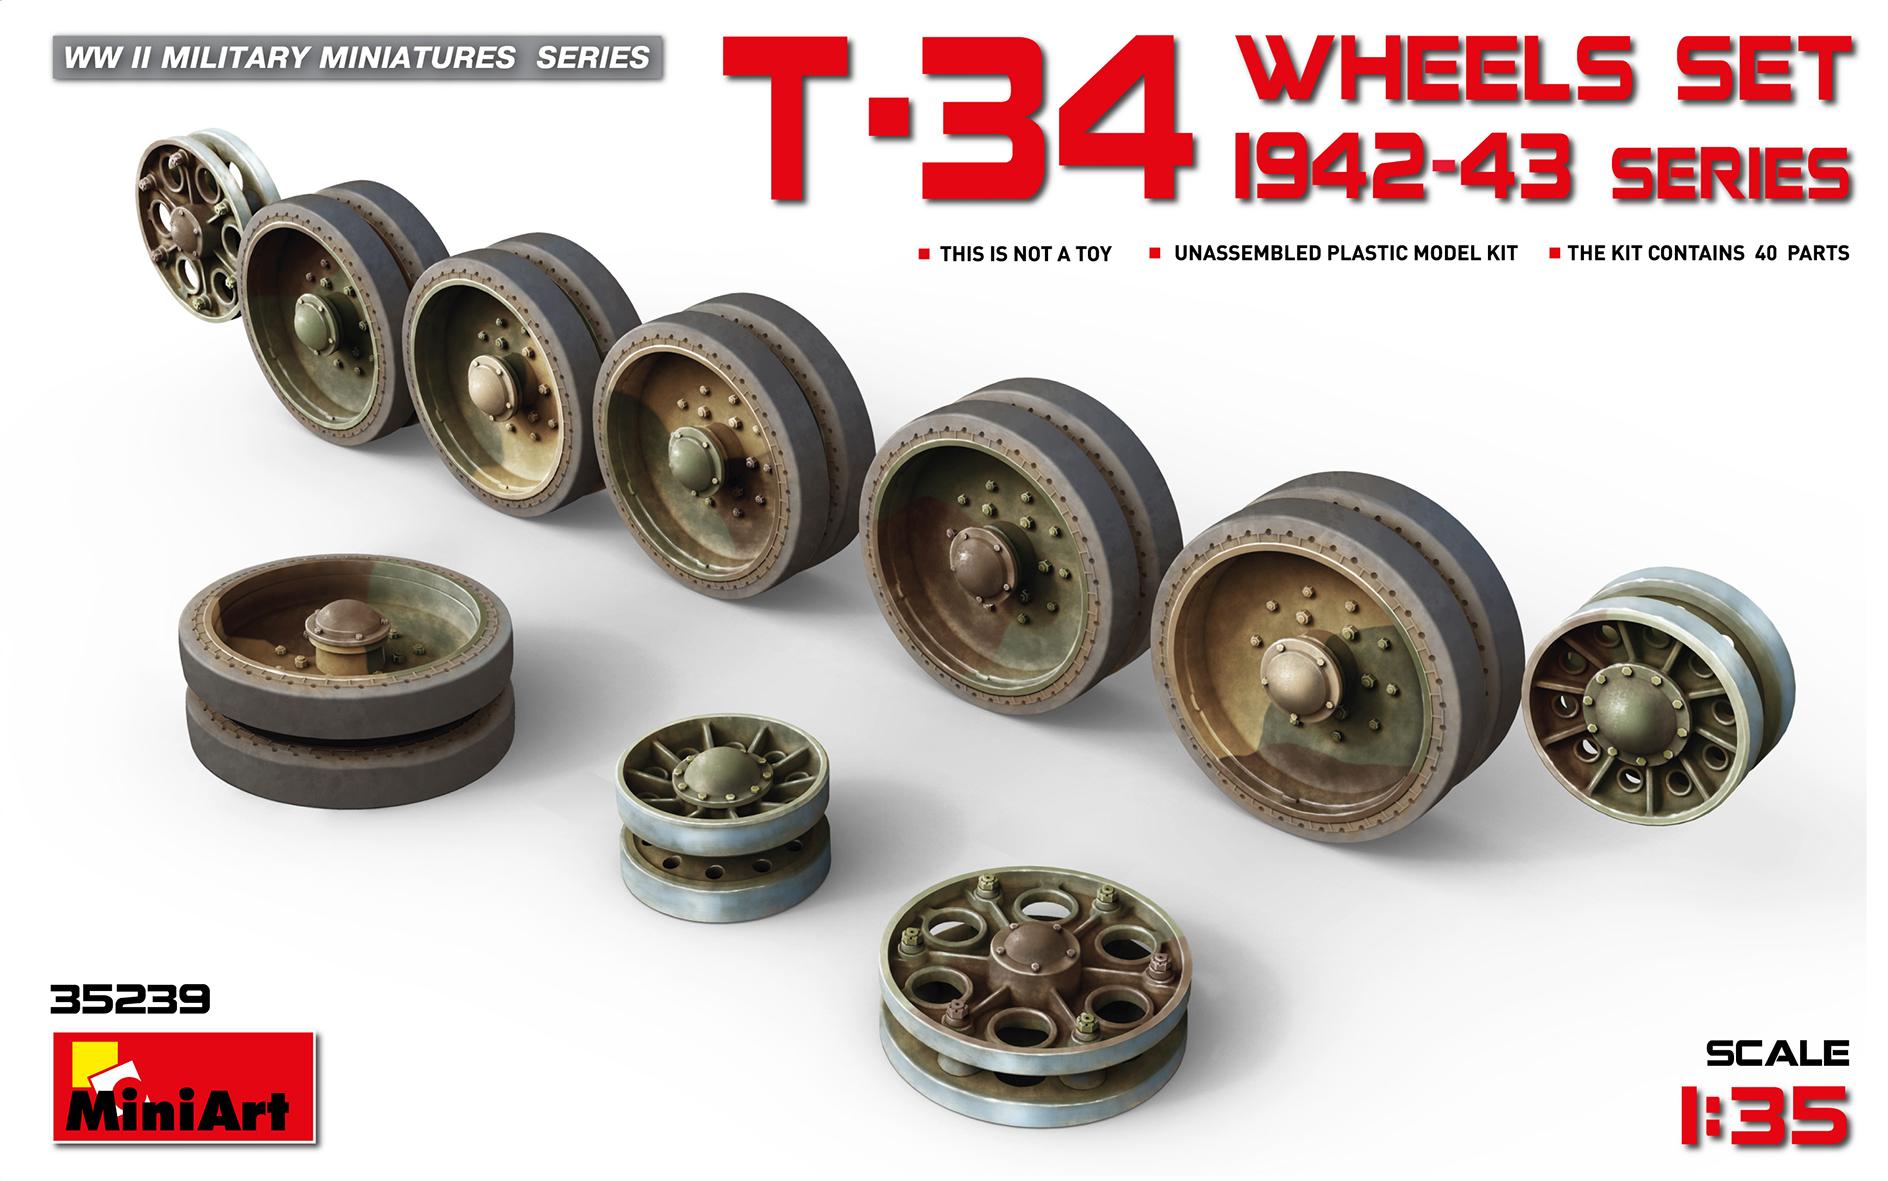 35239 T-34 WHEELS SET. 1942-43 series